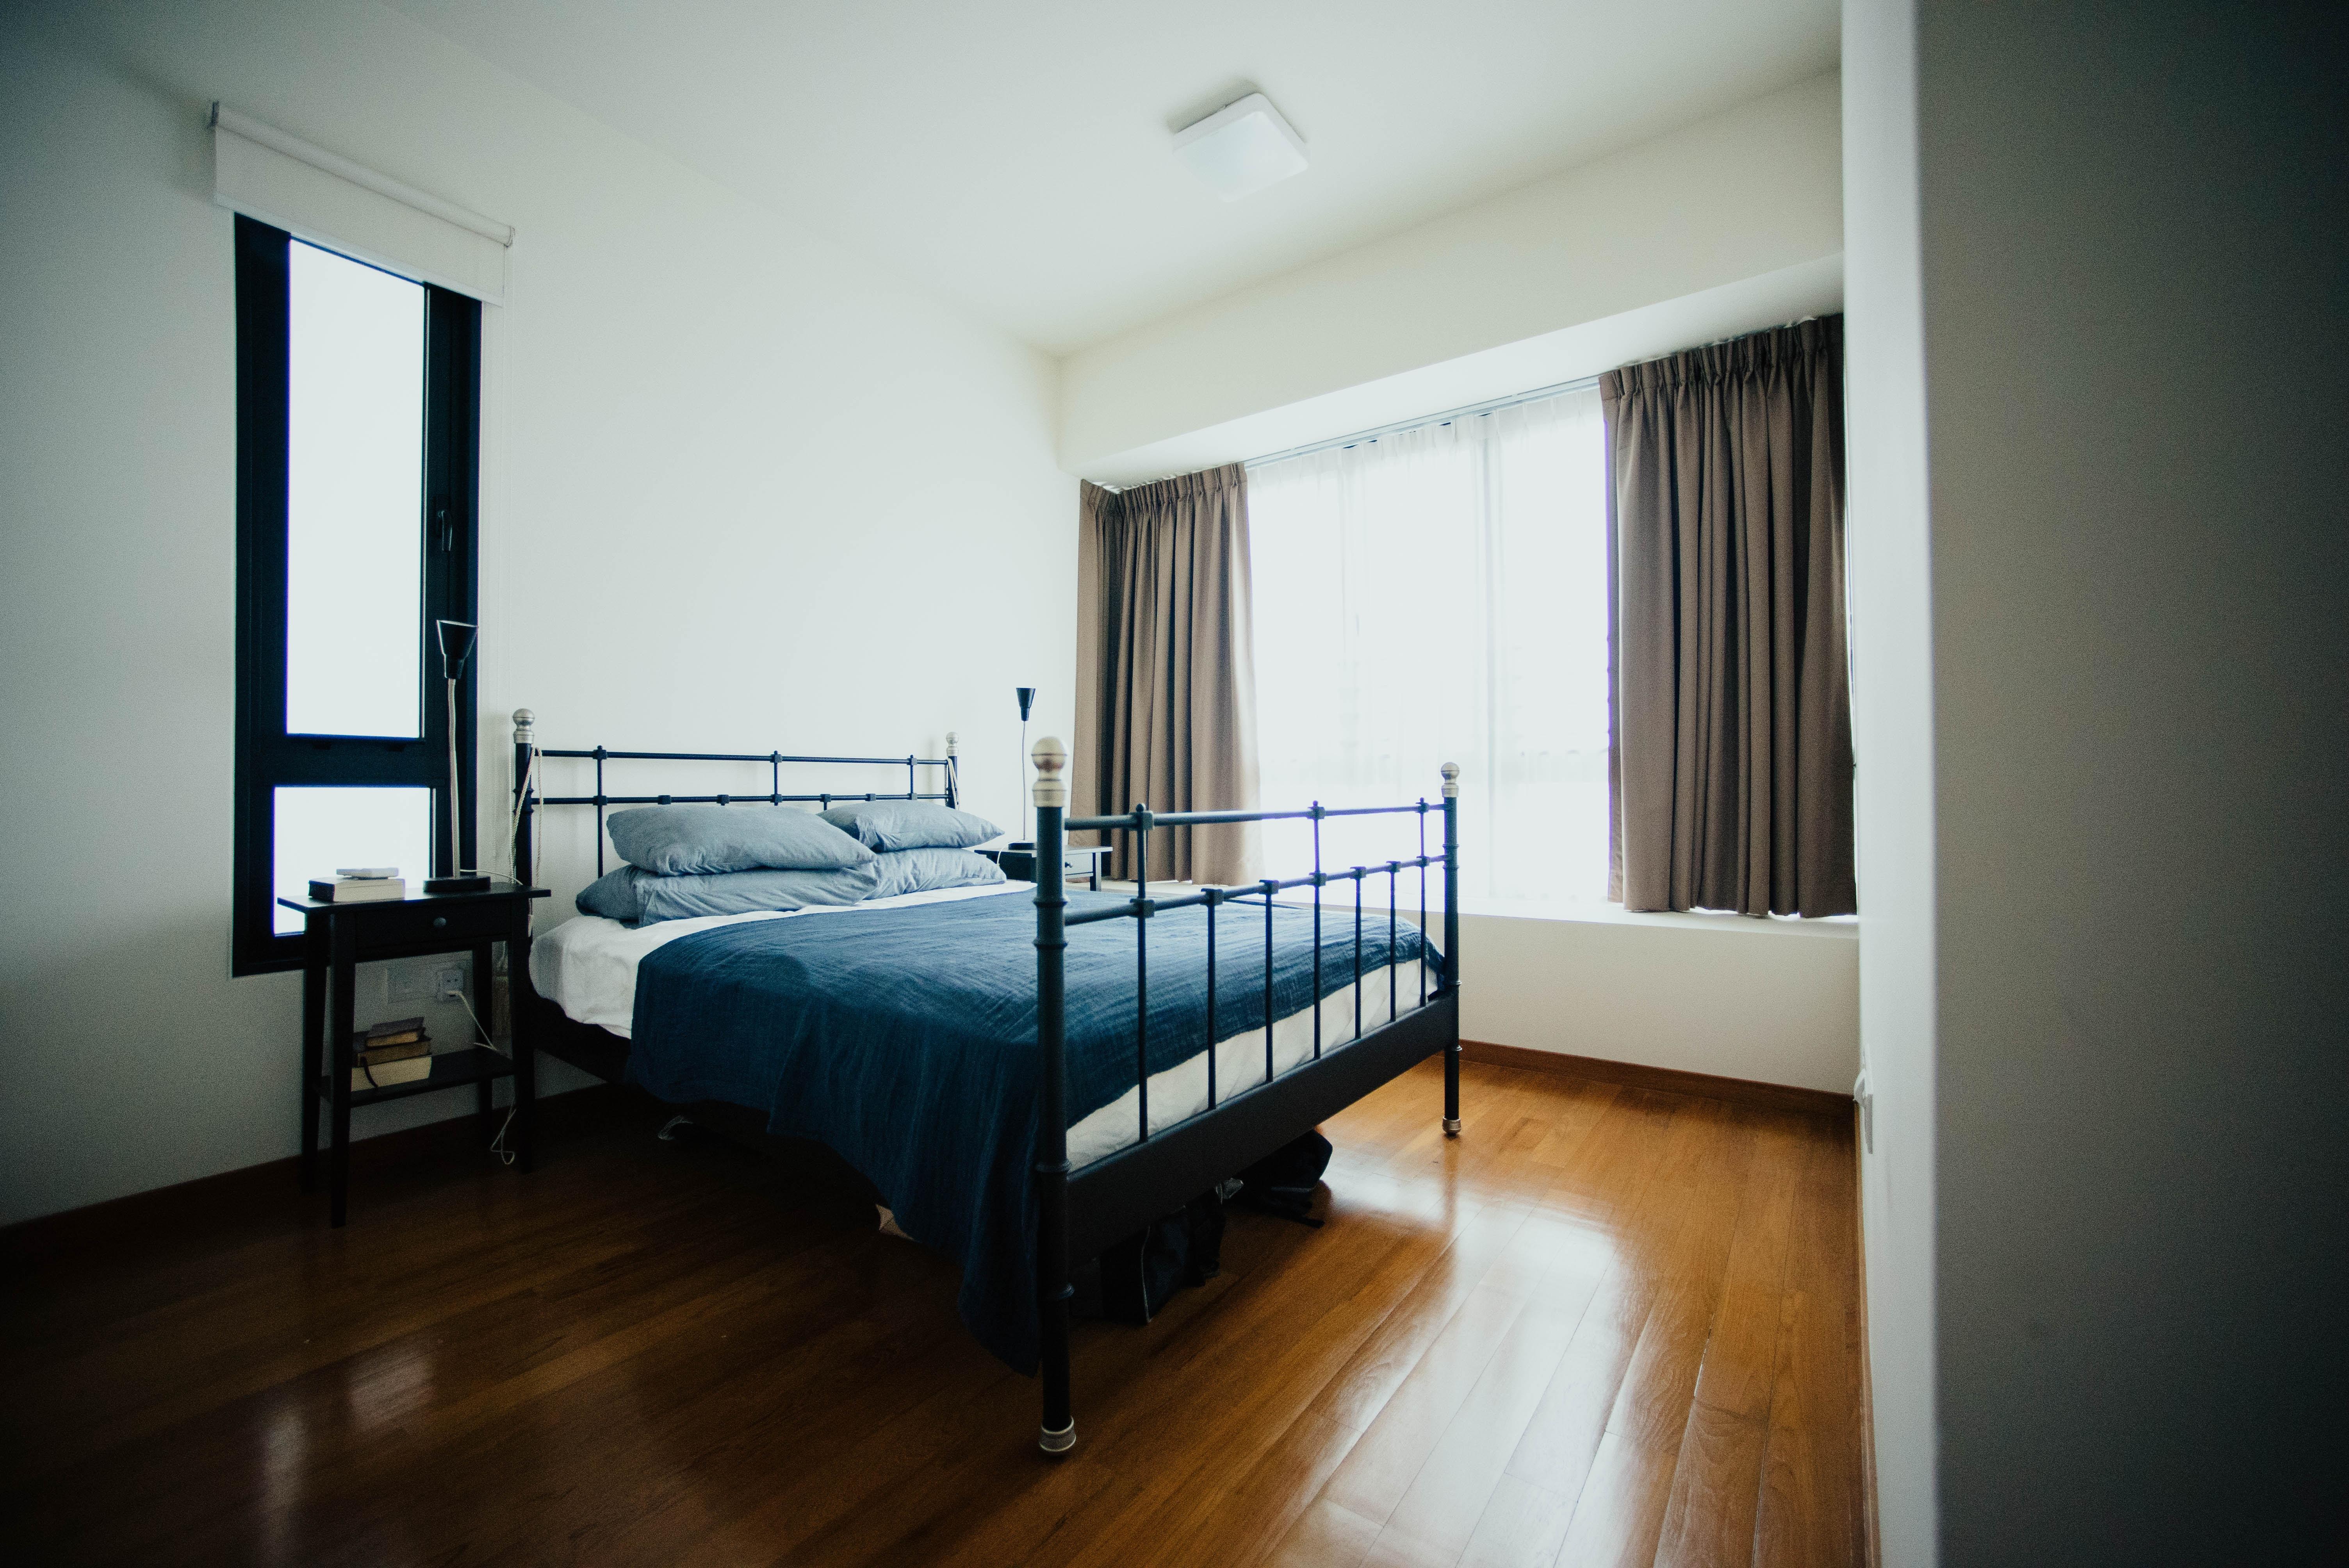 beds - big western bed